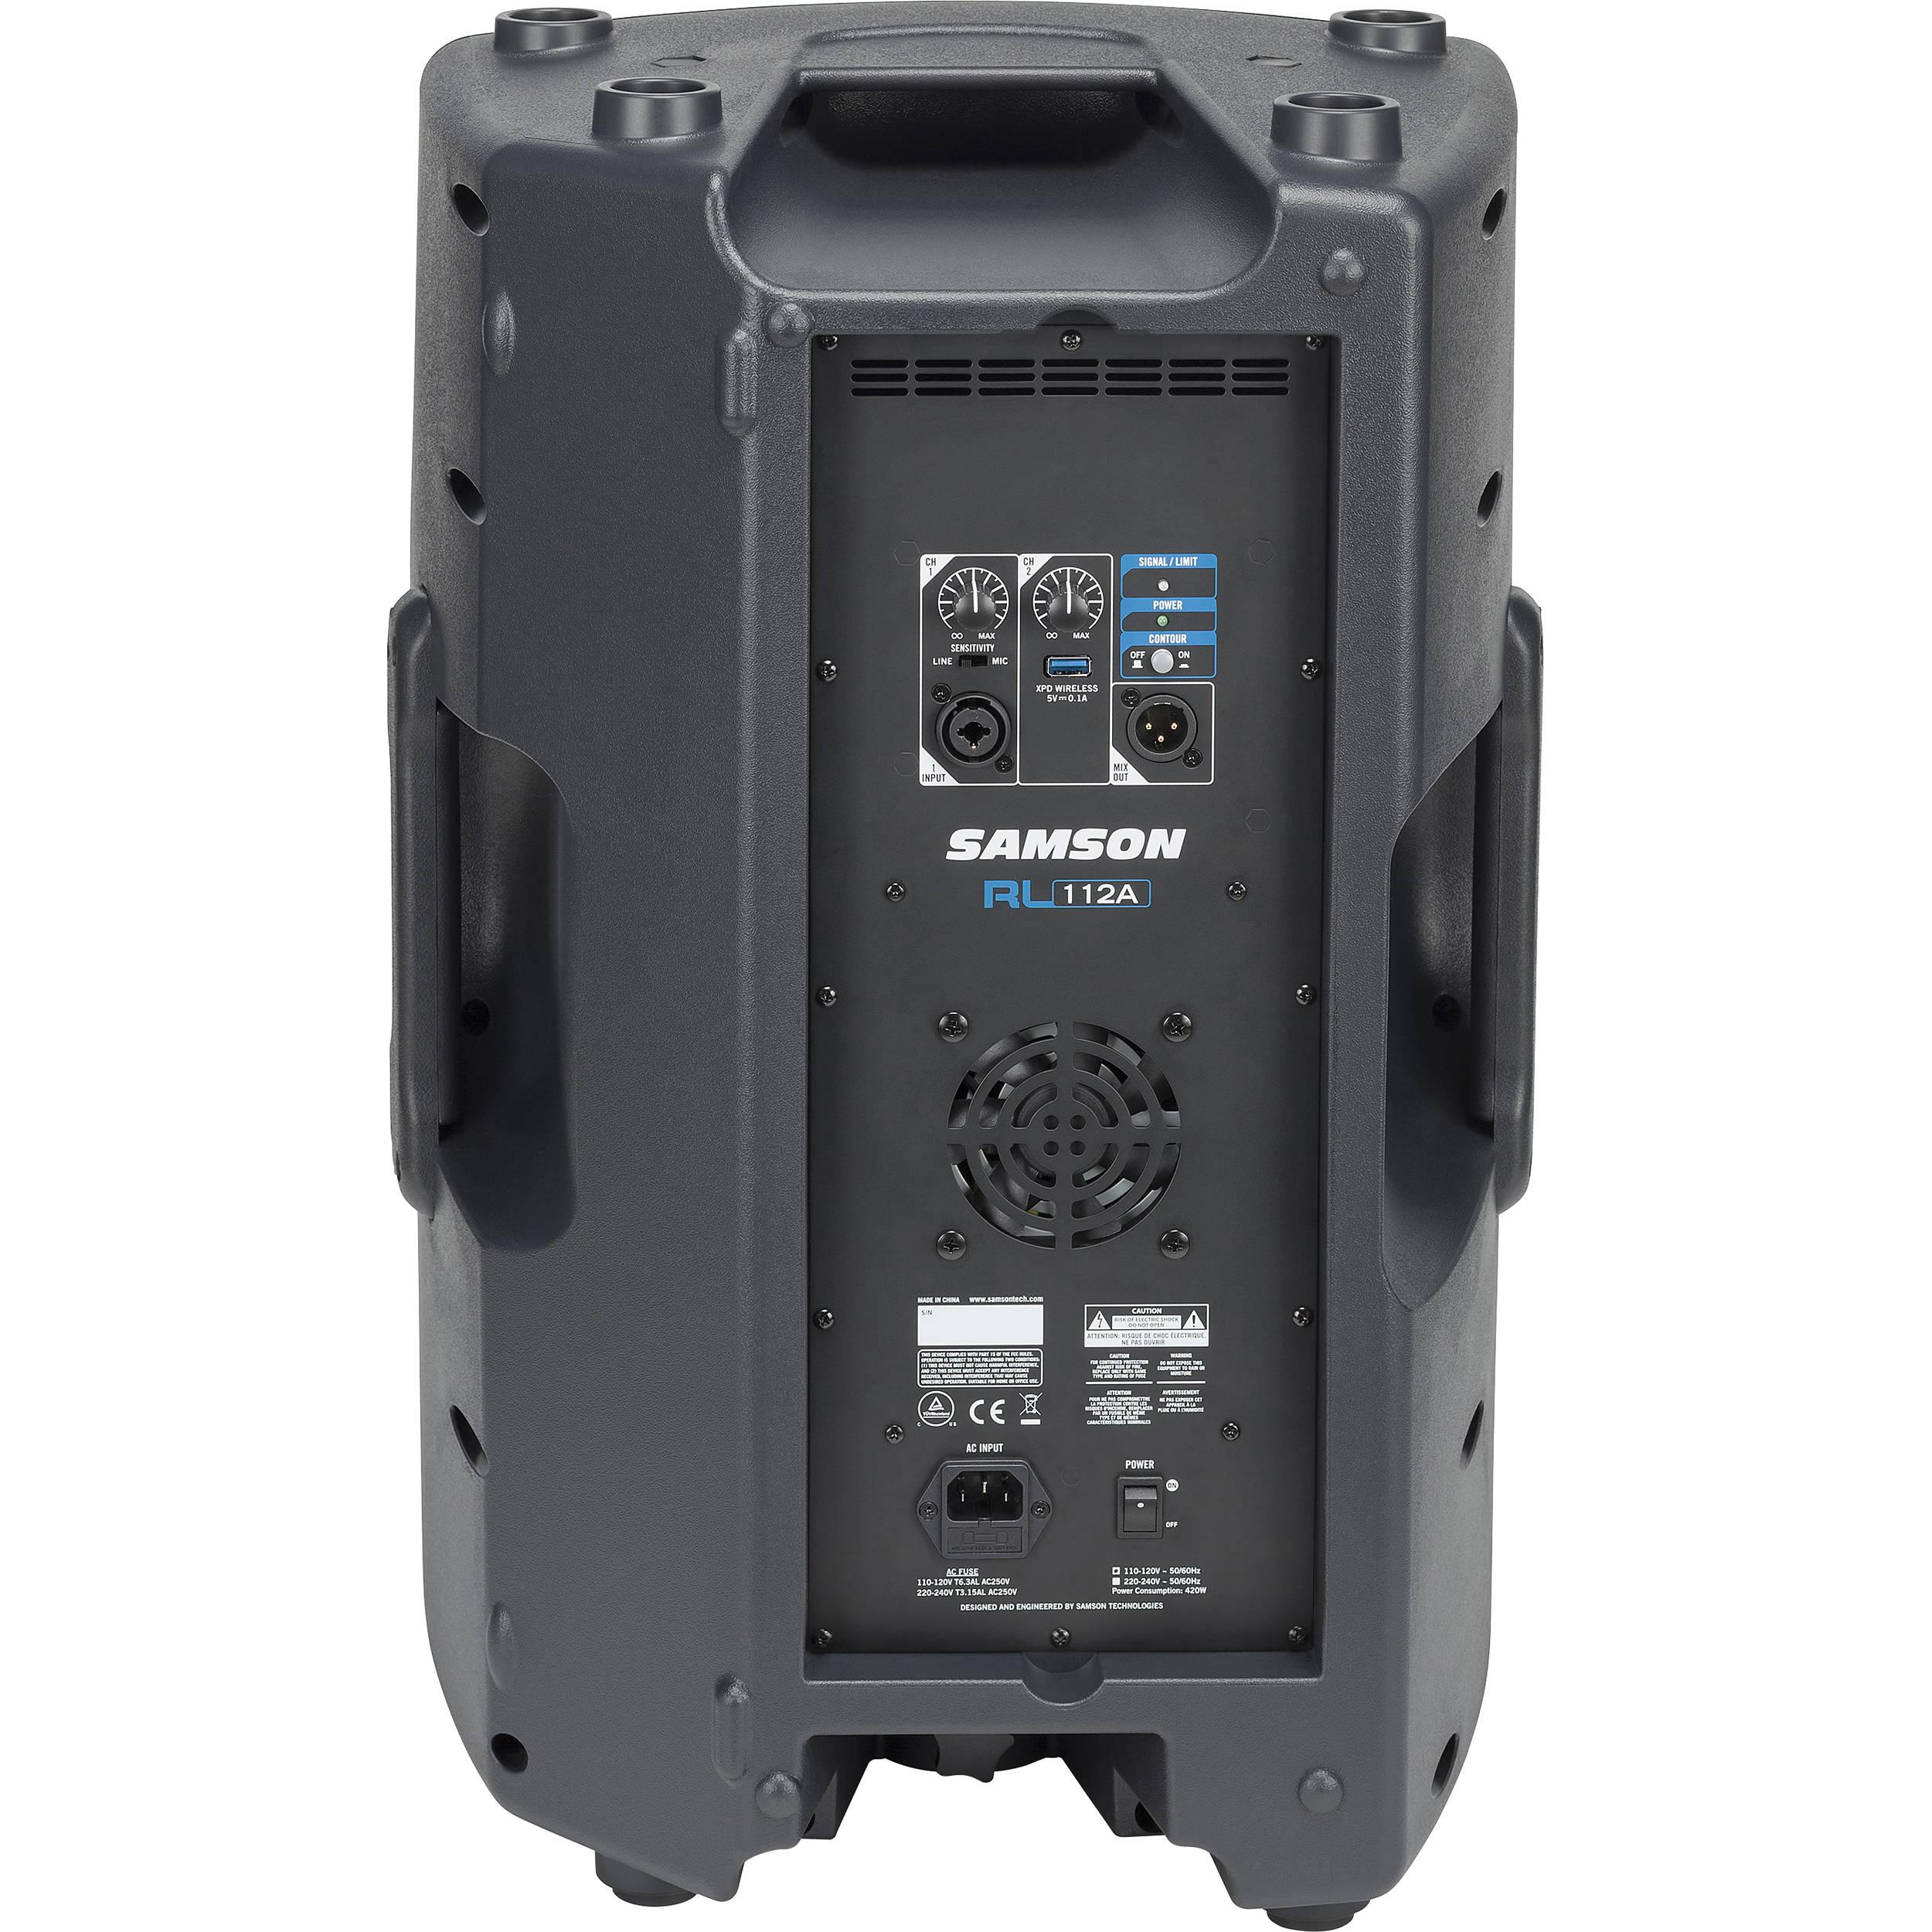 Samson RL112A - 800W 2-Way Active Loudspeaker